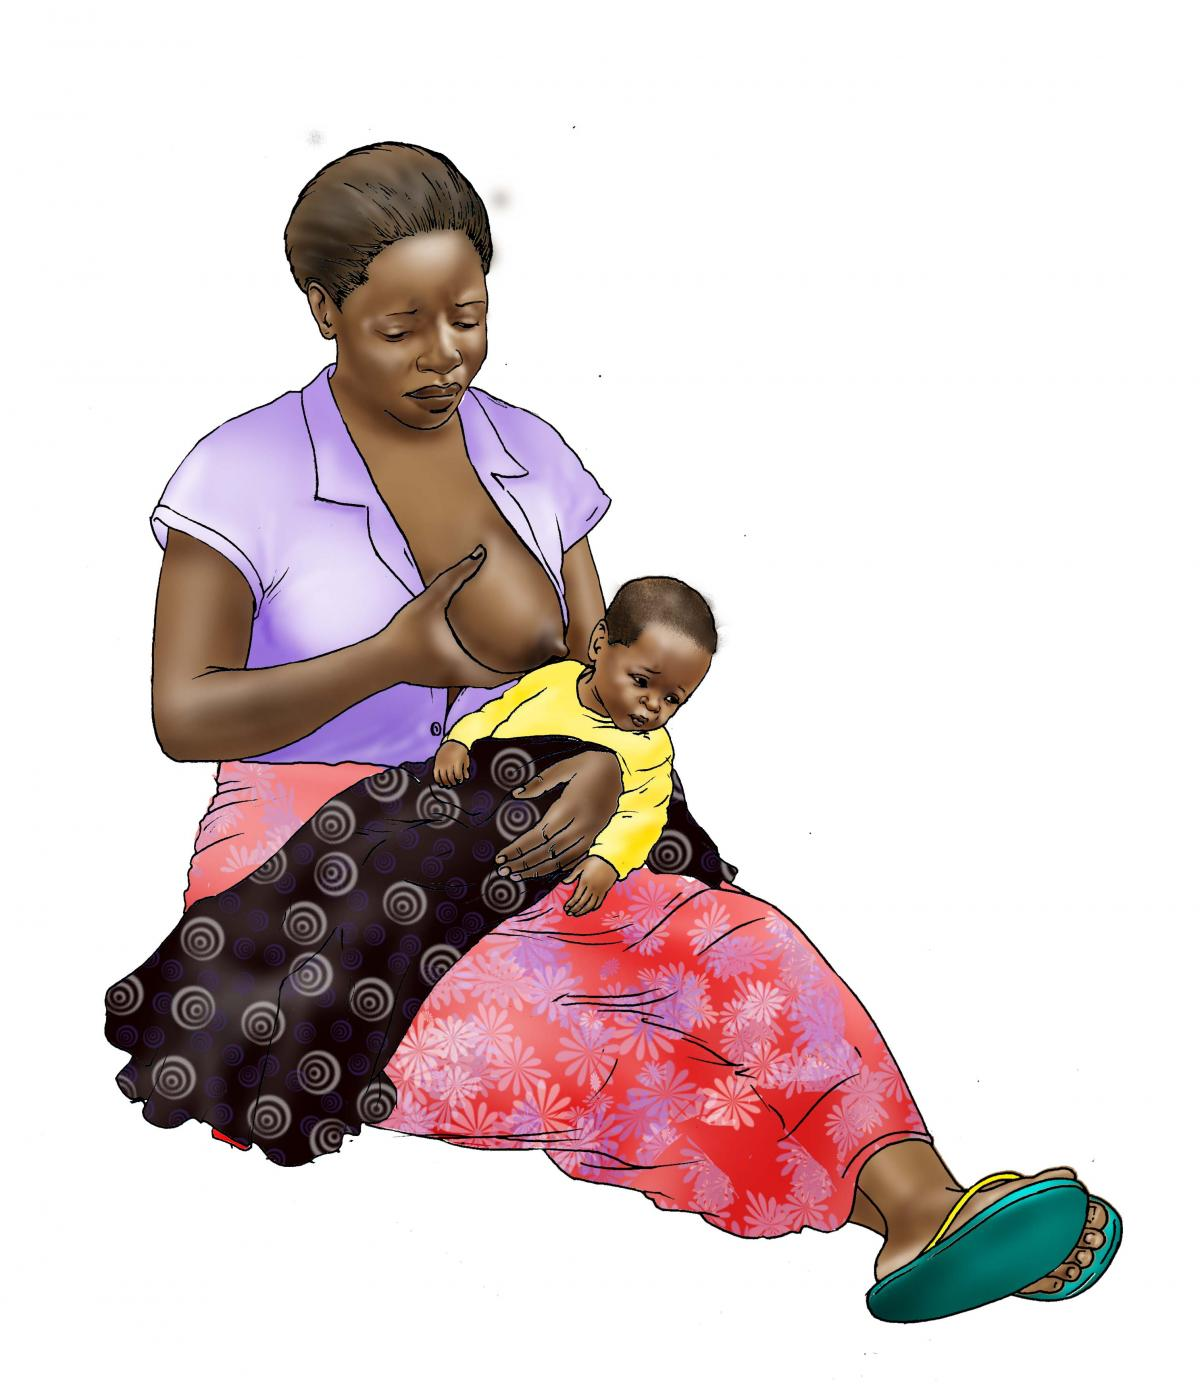 Sick Baby Nutrition - Sick baby refuses to breastfeed - sitting - 01B - Nigeria